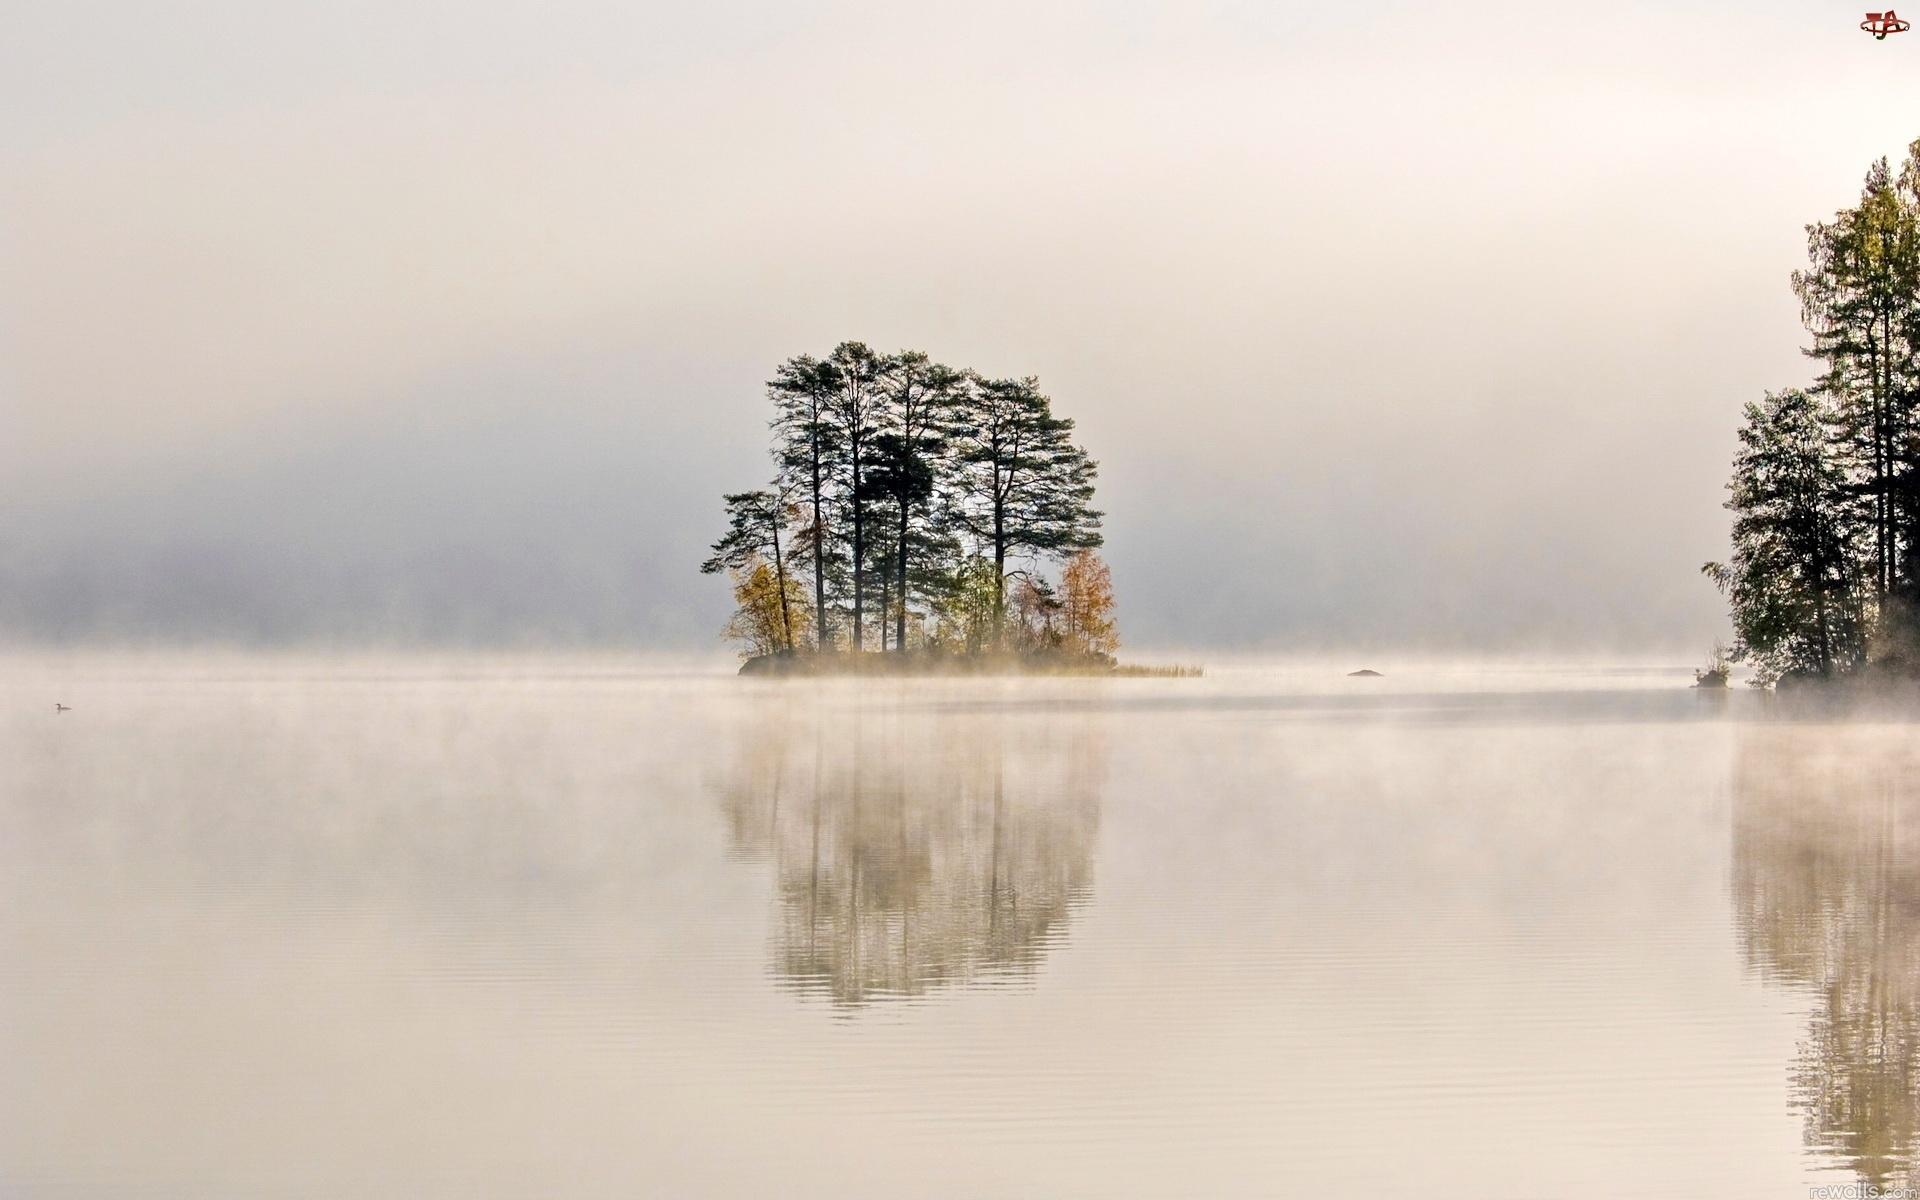 Jezioro, Mgła